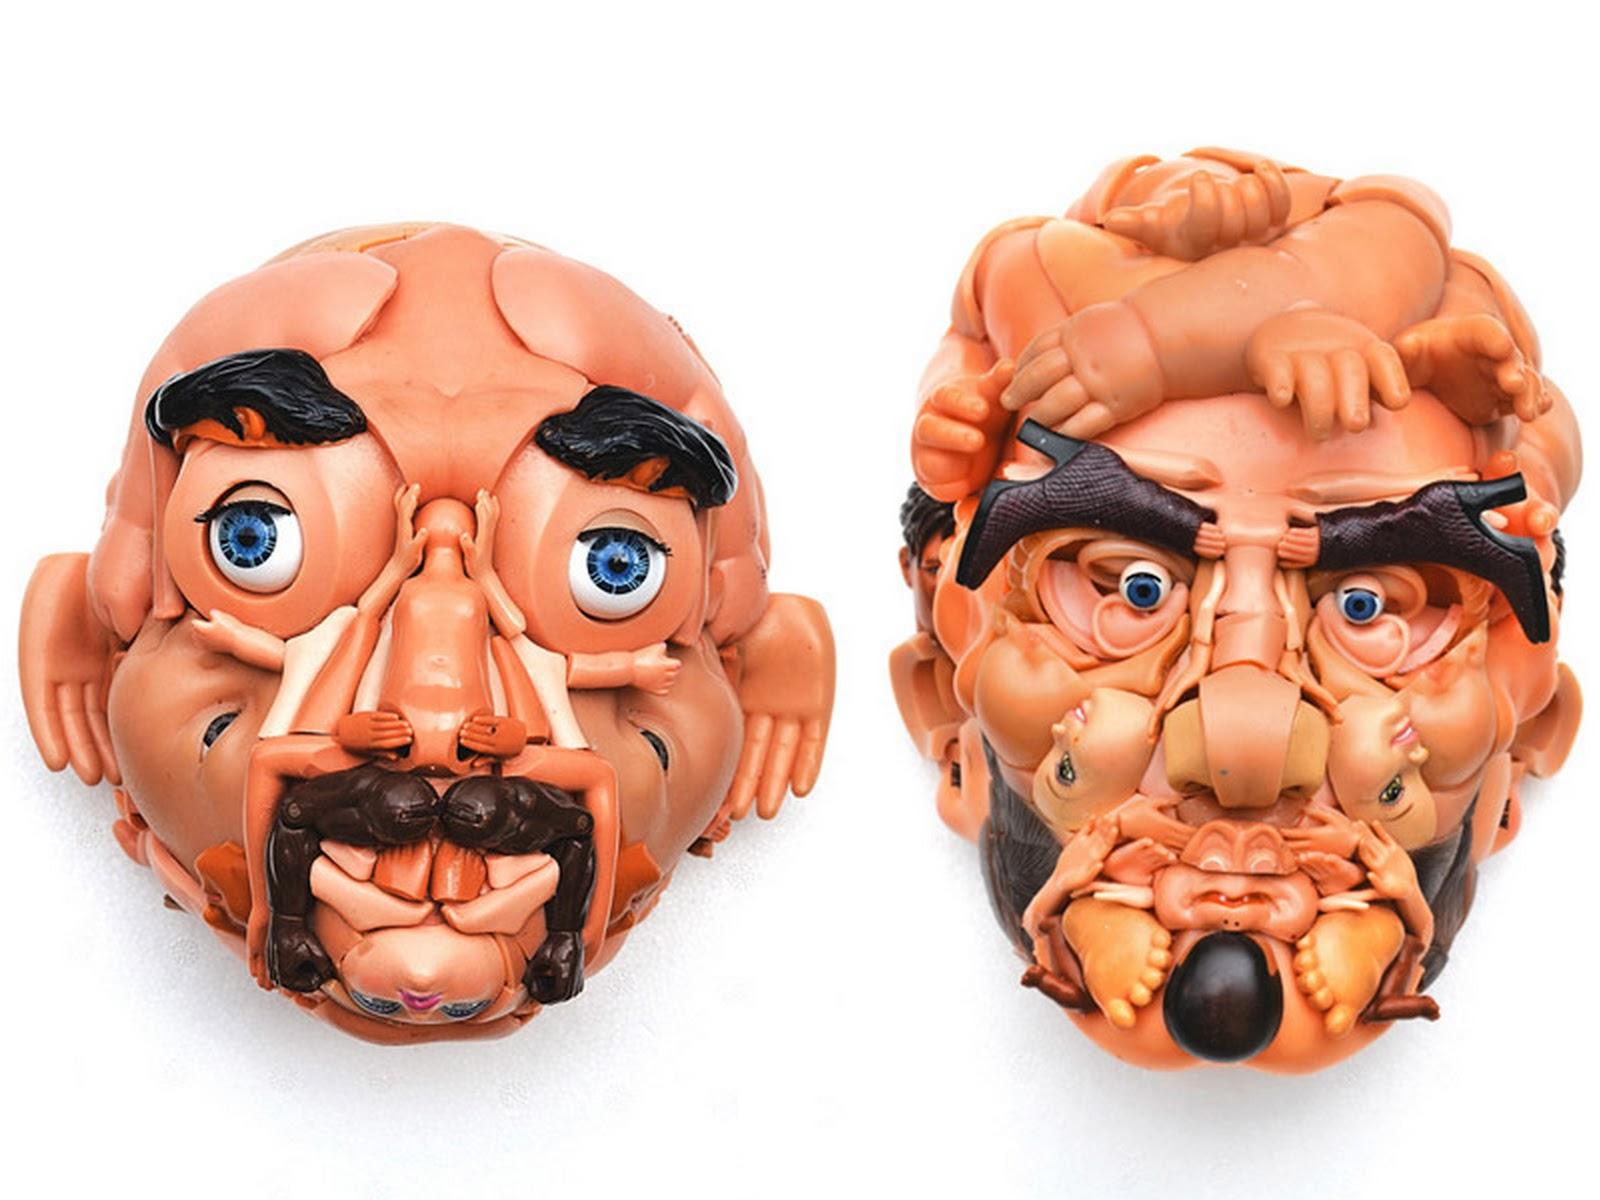 The Toy Sculptures of Freya Jobbins